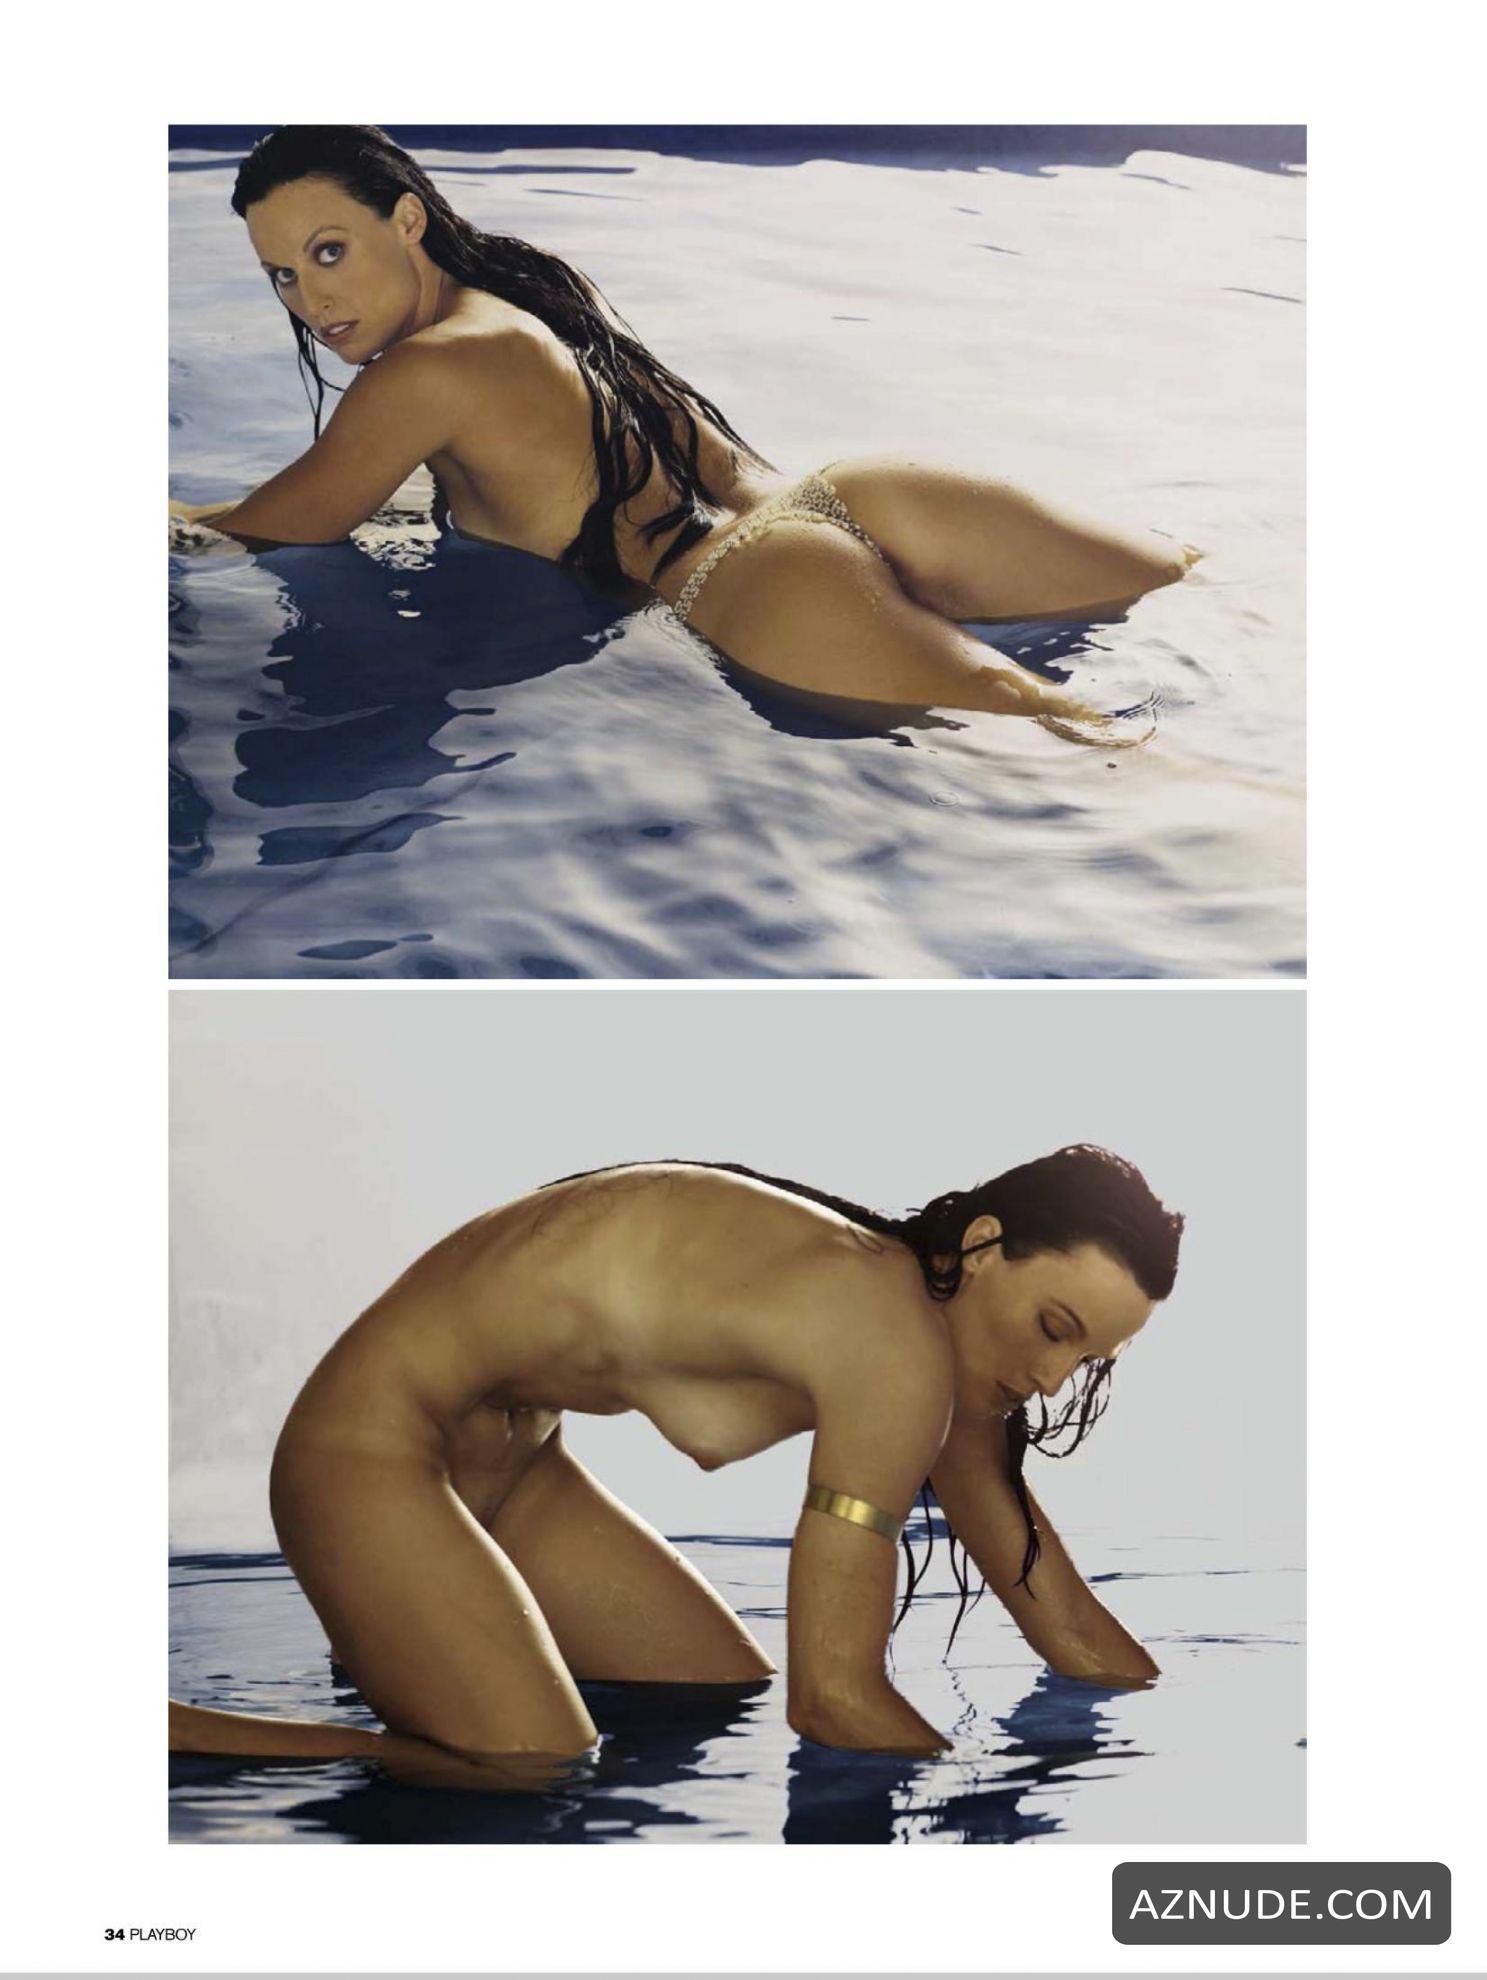 Amanda Beard Playboy Pics browse movie sorted images - page 1302 - aznude